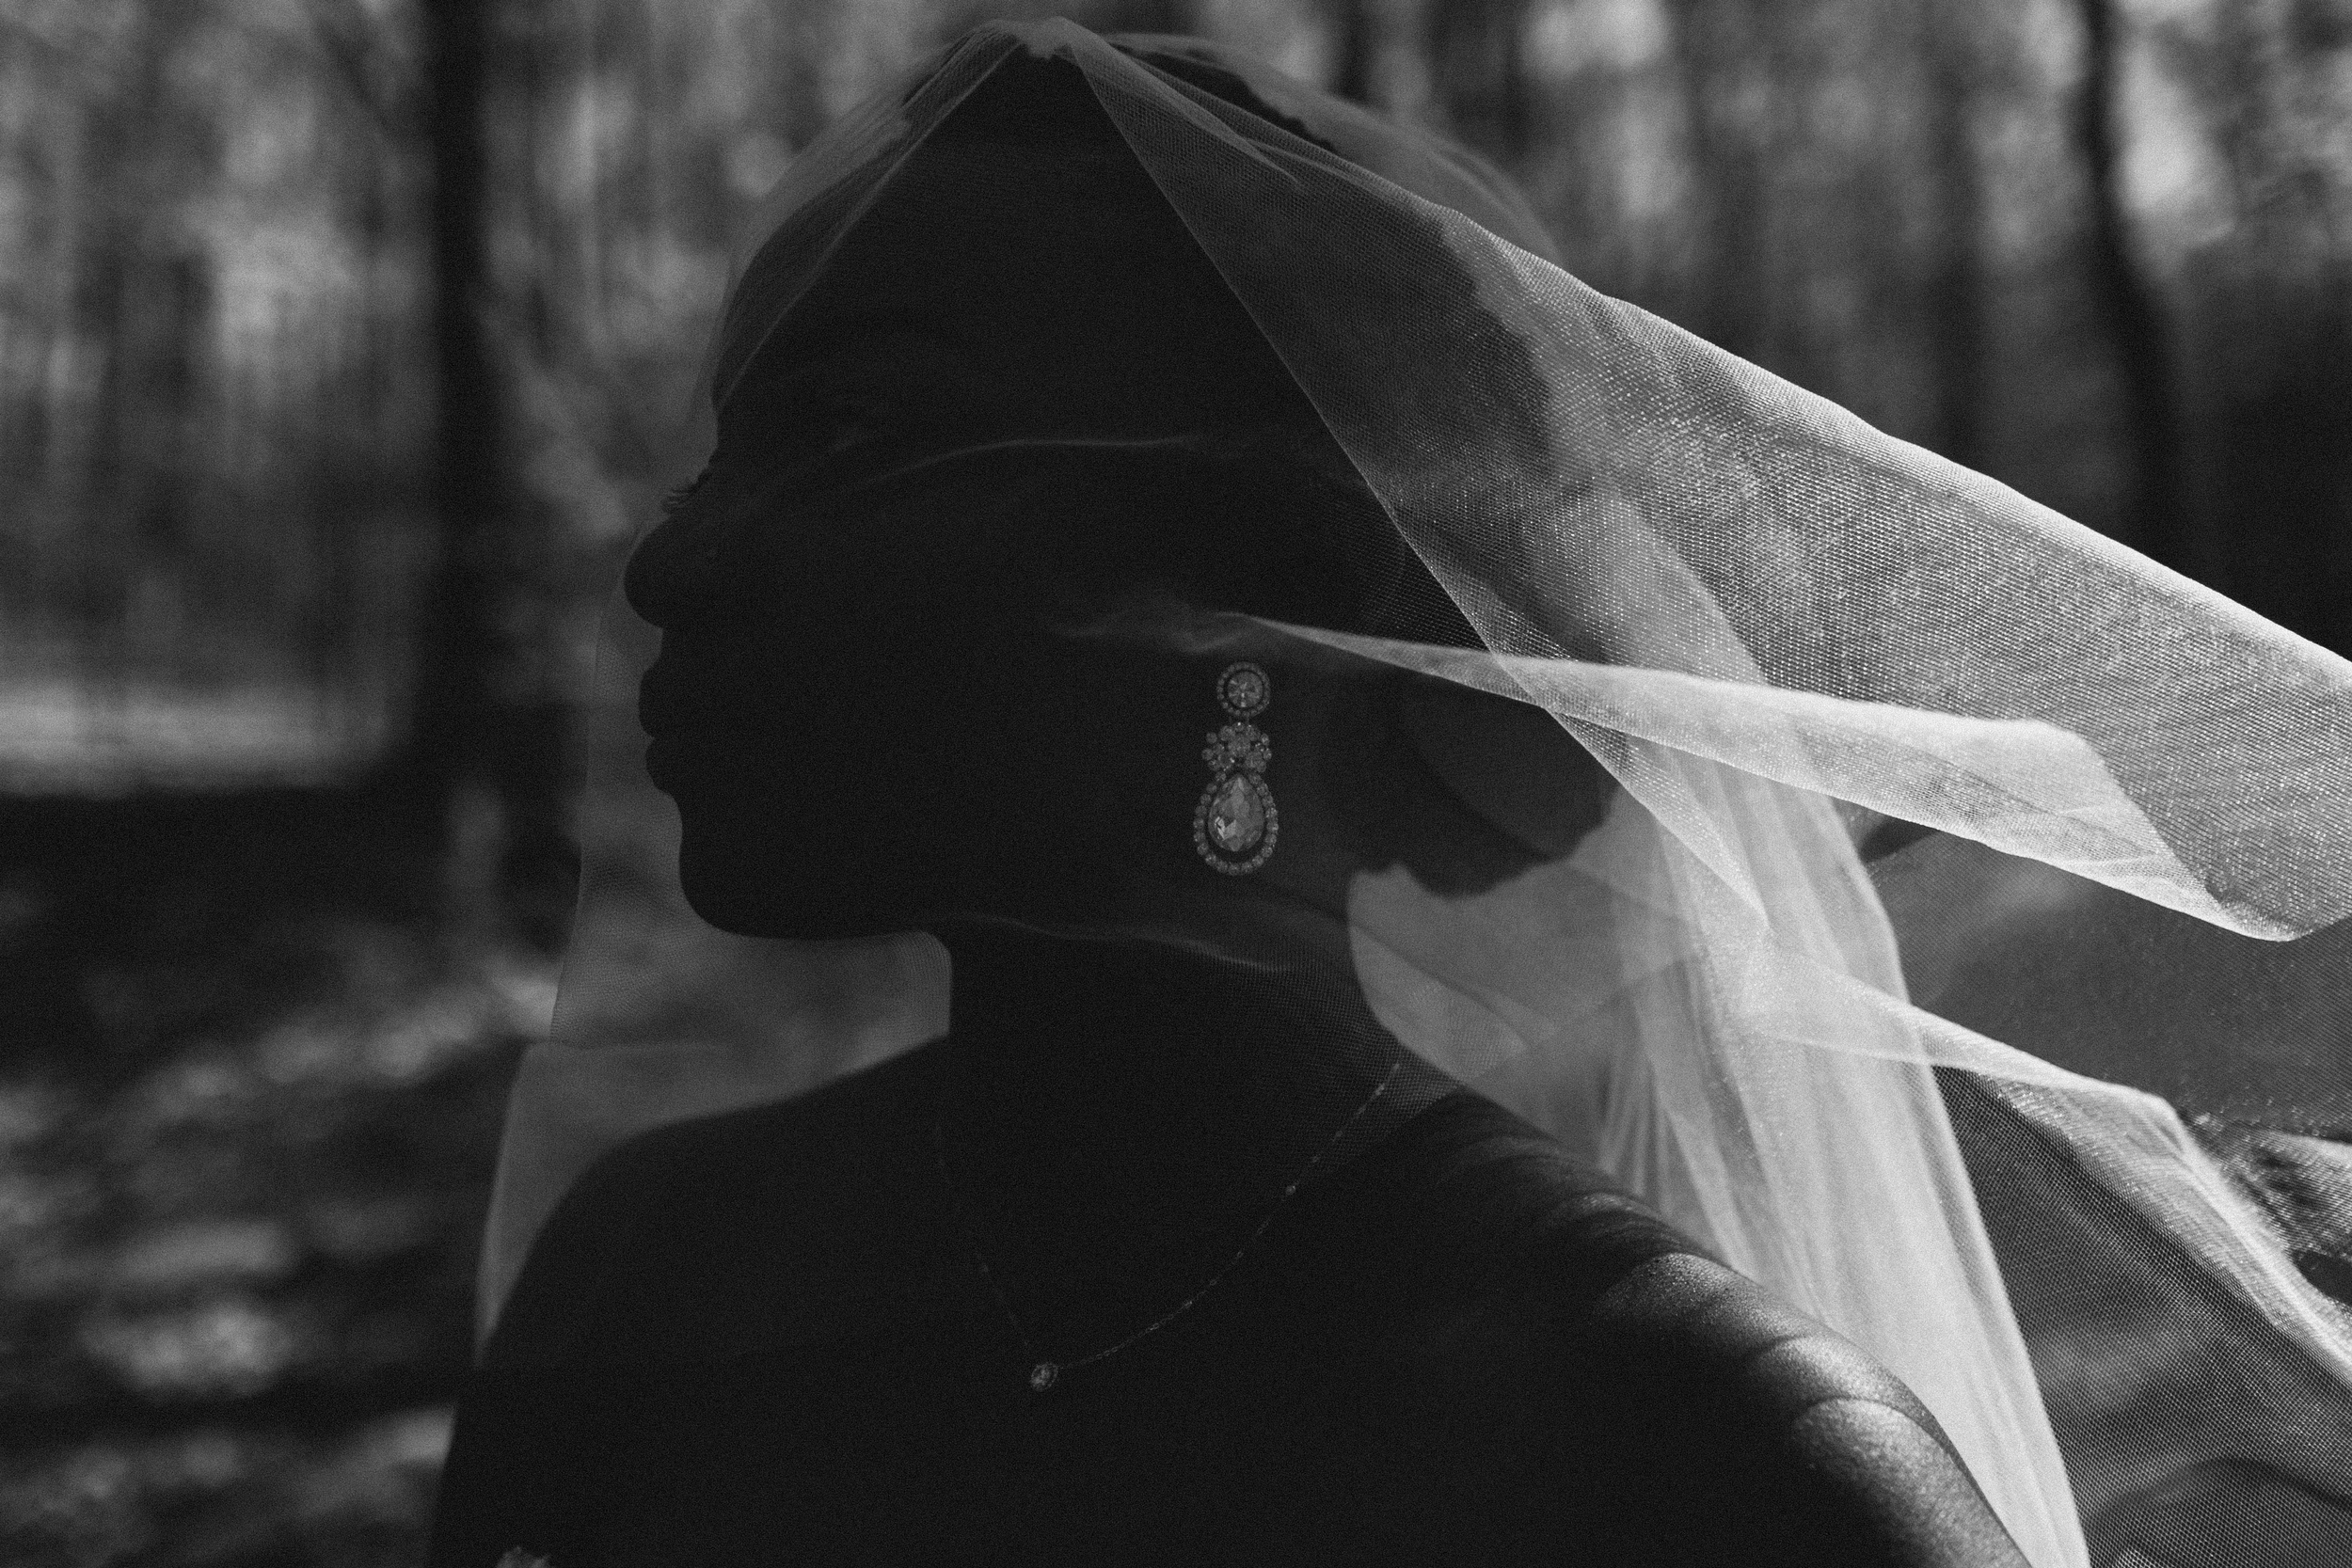 Atlanta_Wedding_Abi_Q_Photography-1-2.jpg